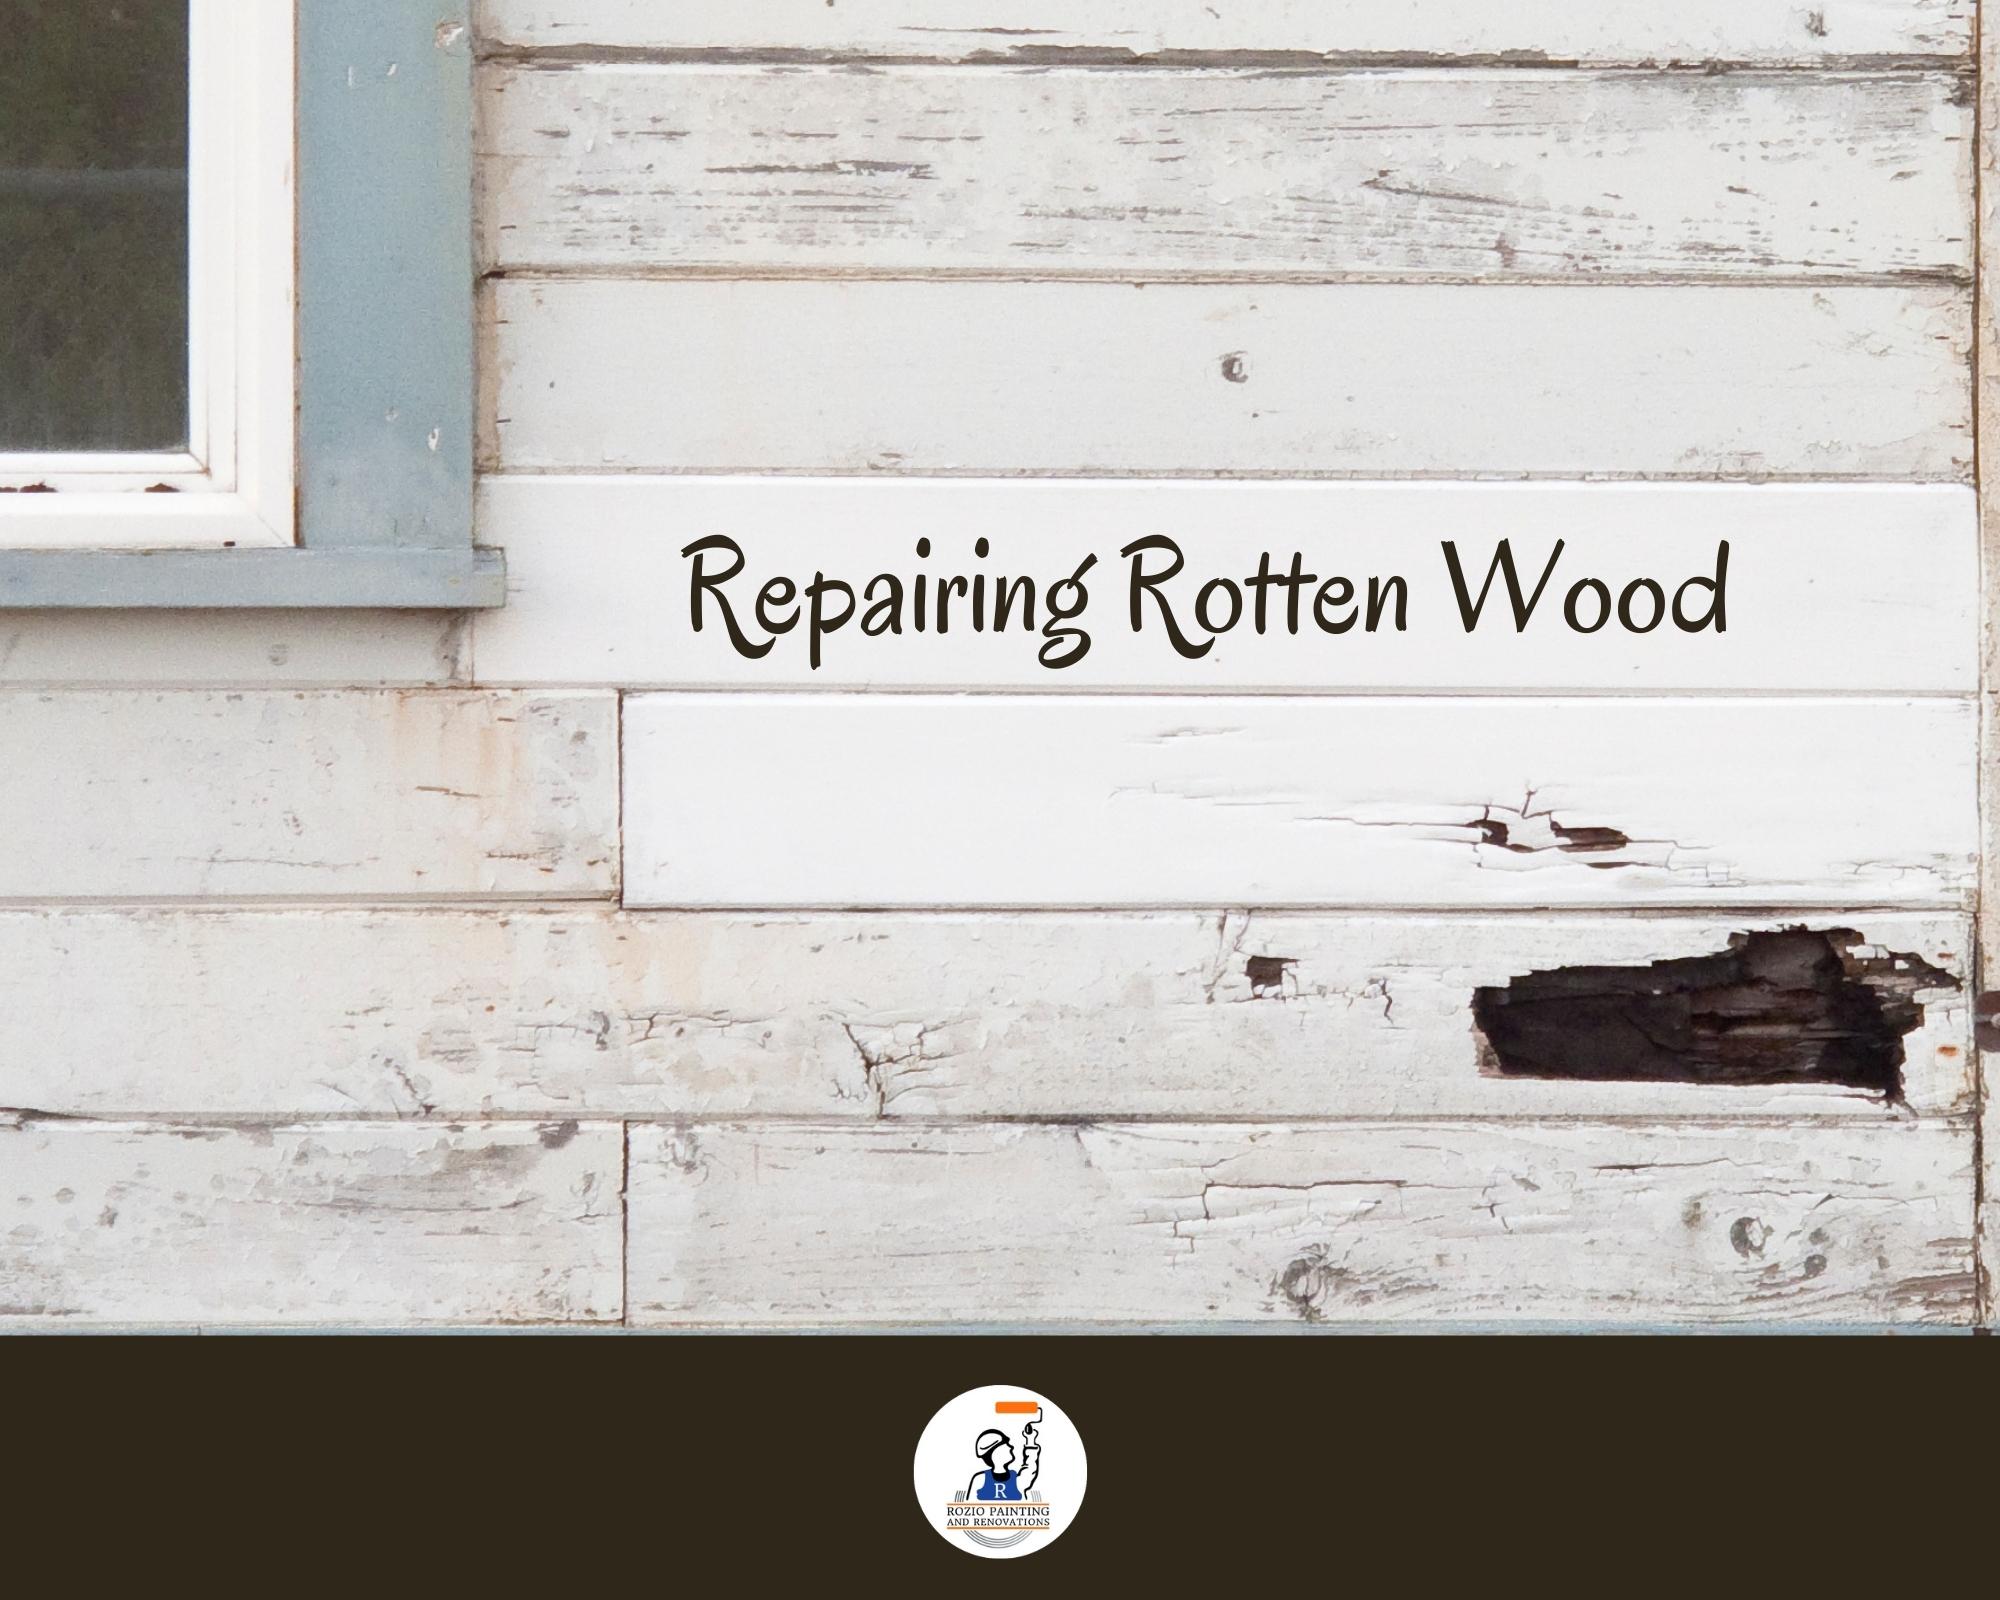 Repairing Rotten Wood